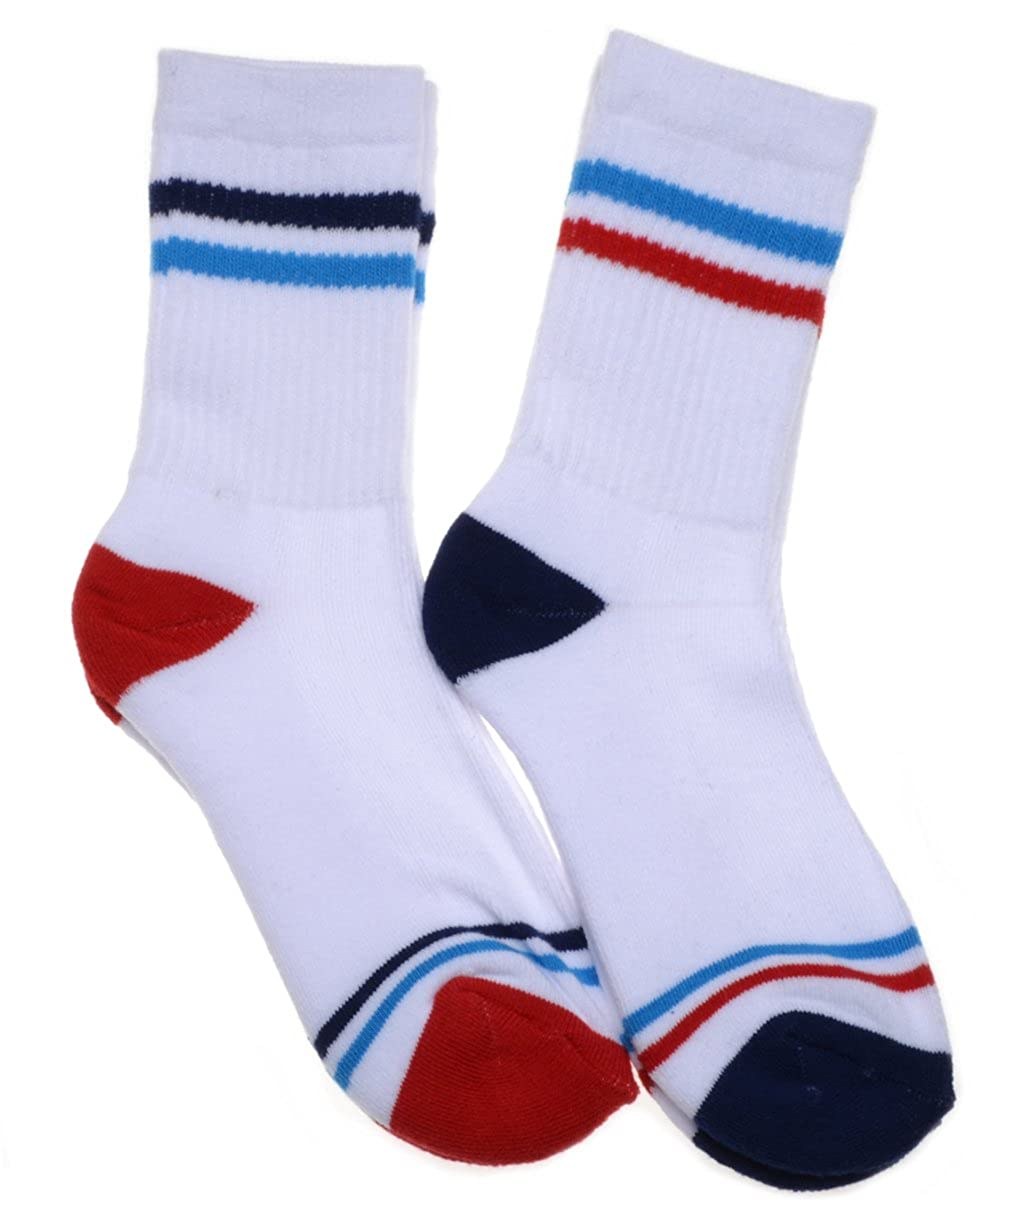 2 pairs of Childrens White Sports socks